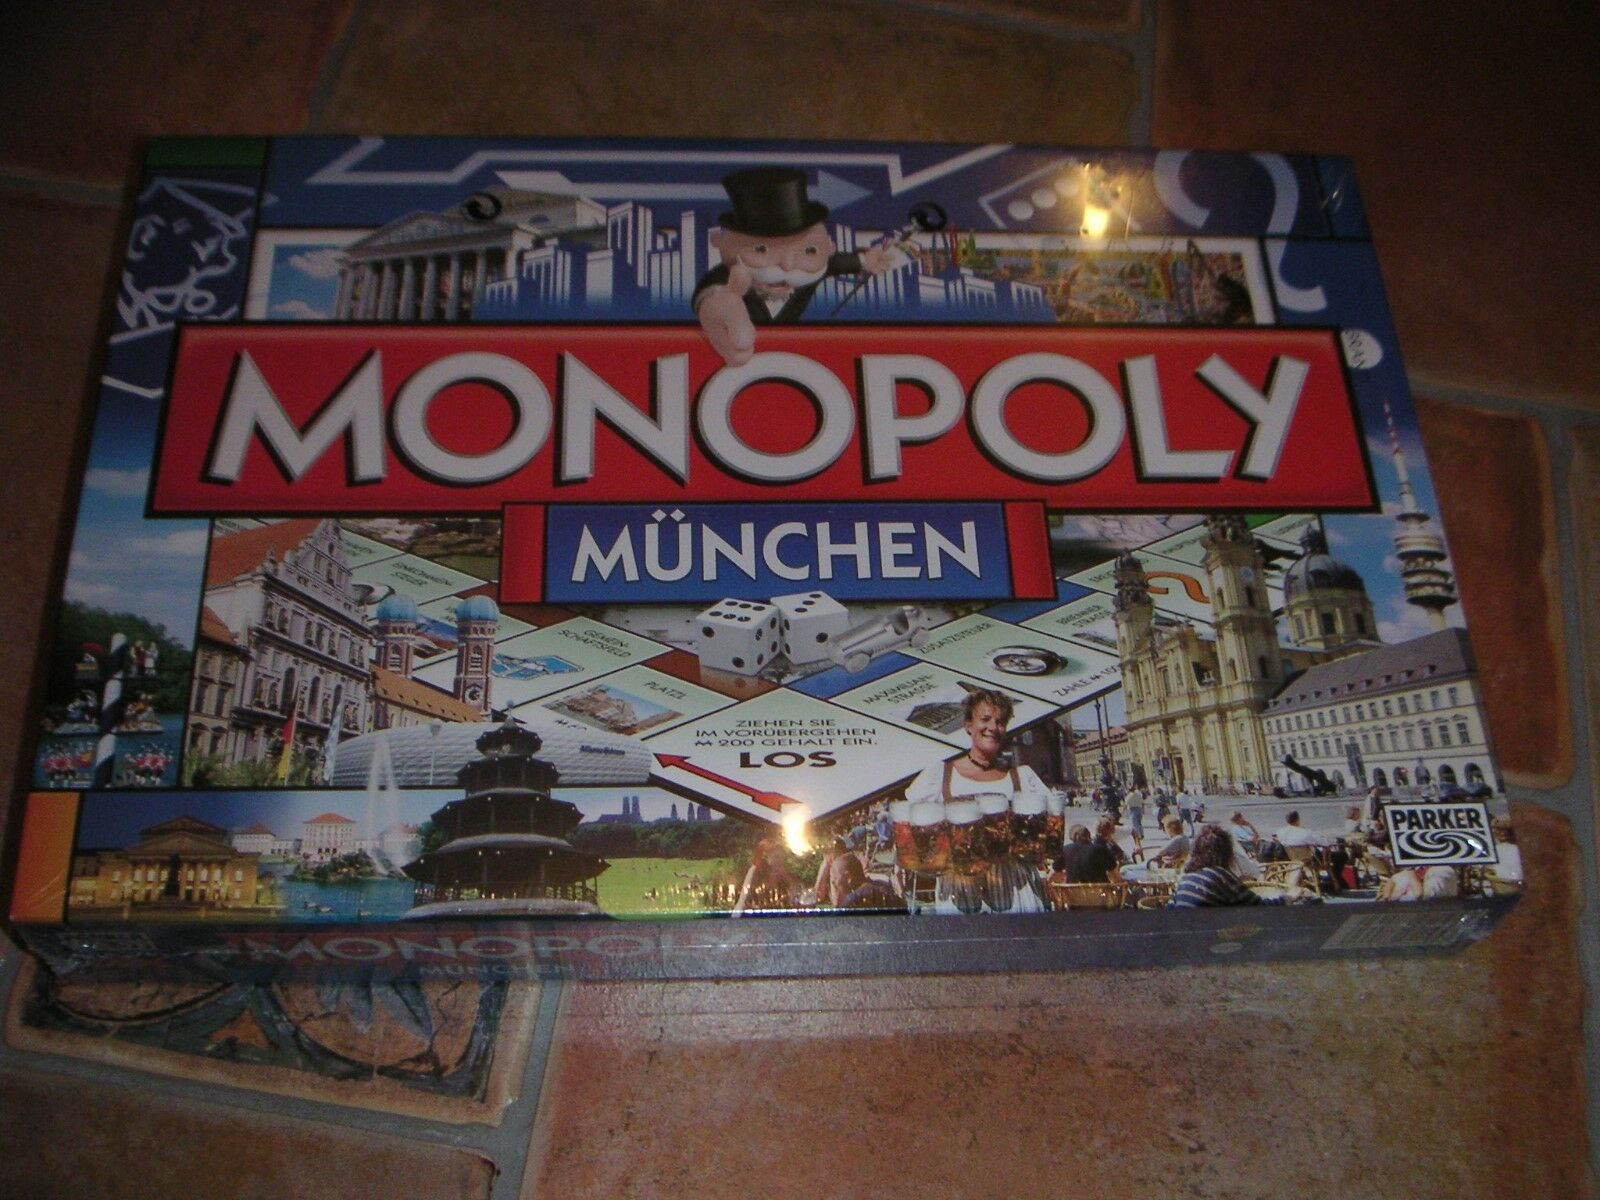 Brettspiel Monopoly München in Folie verpackt gesuchte Sammlerausgabe Sammlerausgabe Sammlerausgabe 334fb9